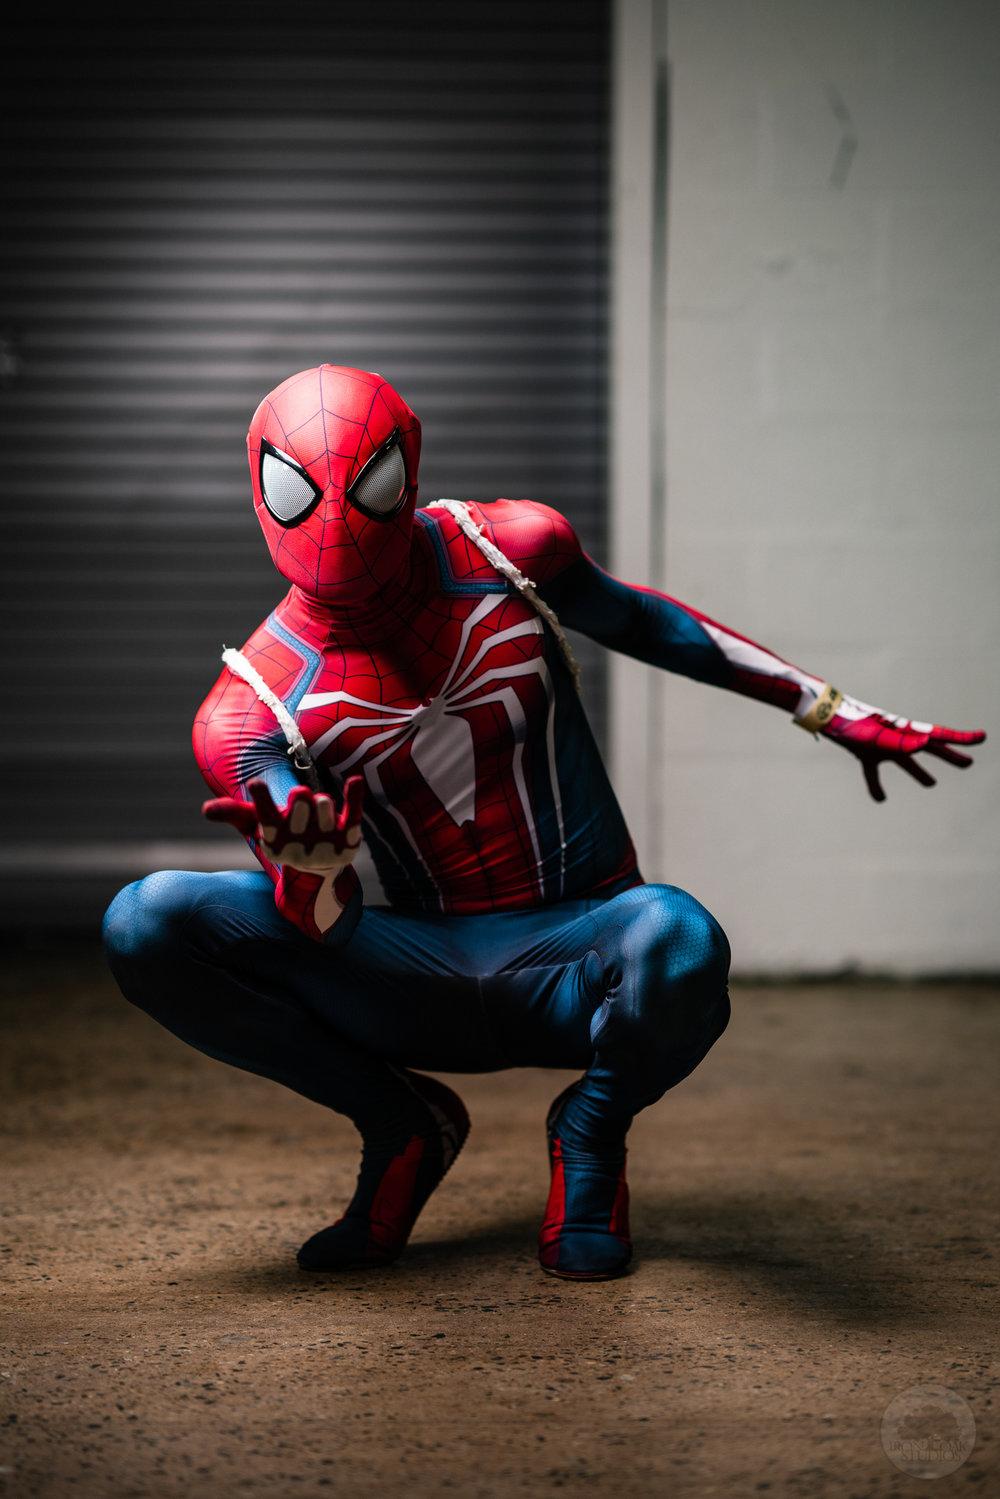 IronOakStudios_Phila_ComicCon_Spider-Man_Cosplay-2.jpg